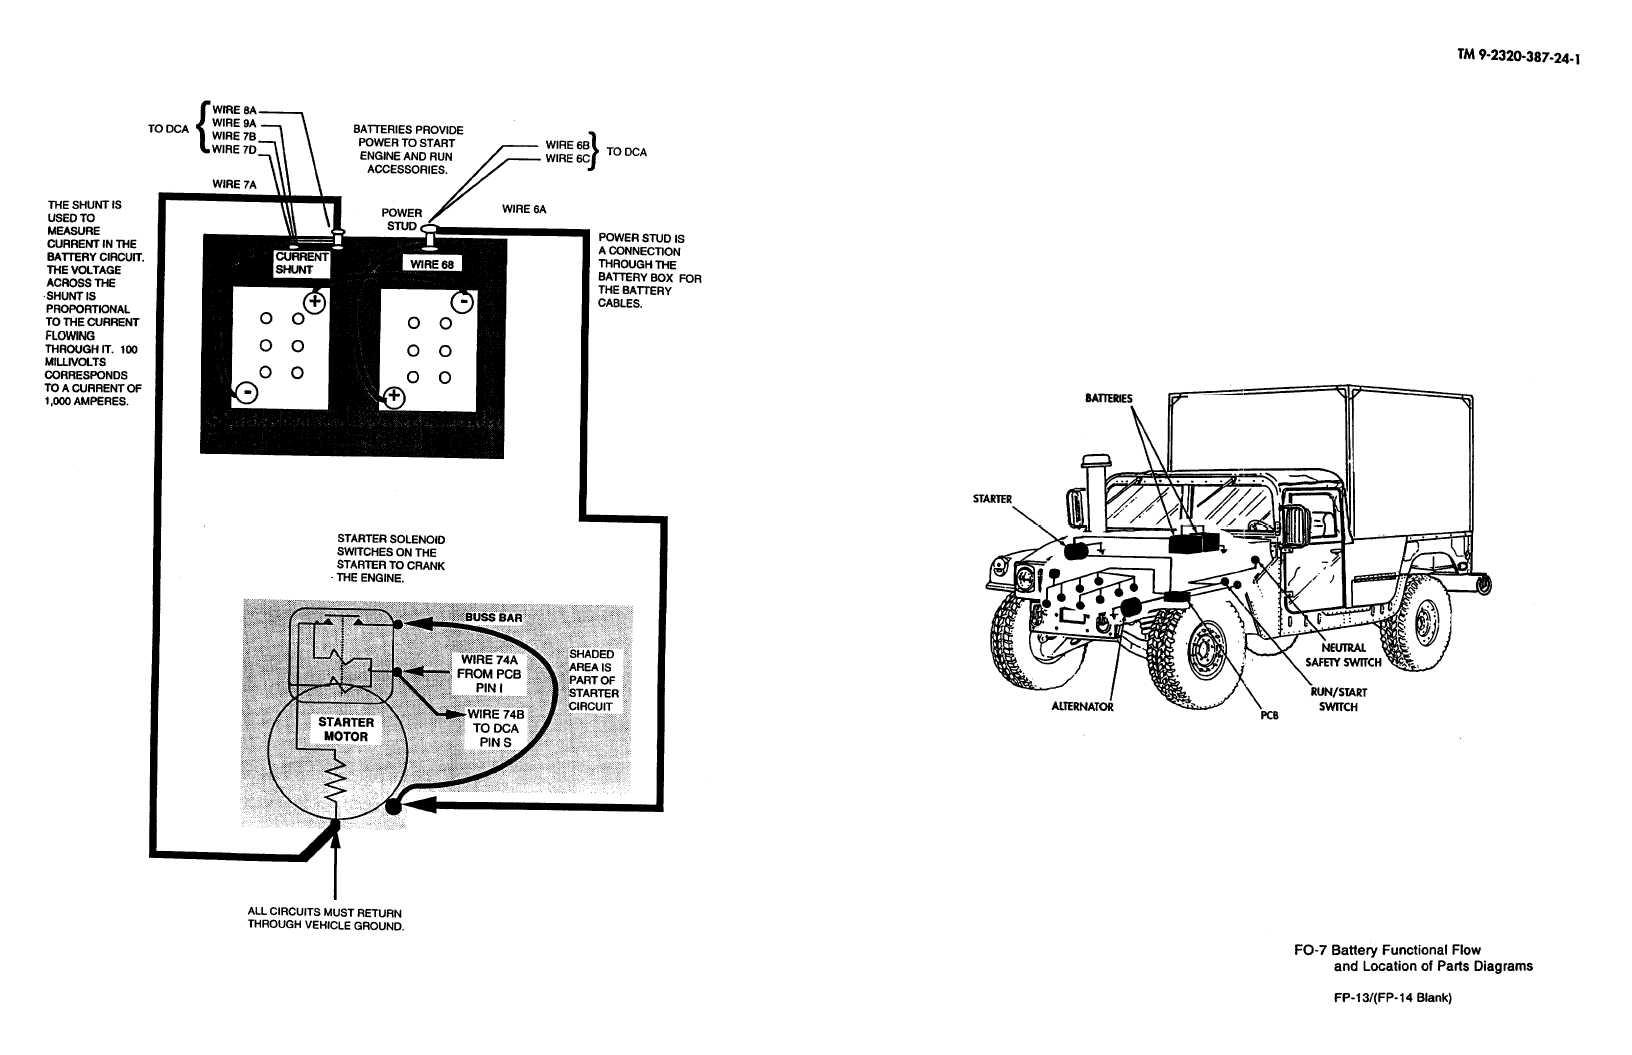 ford 9000 vnr wiring diagram